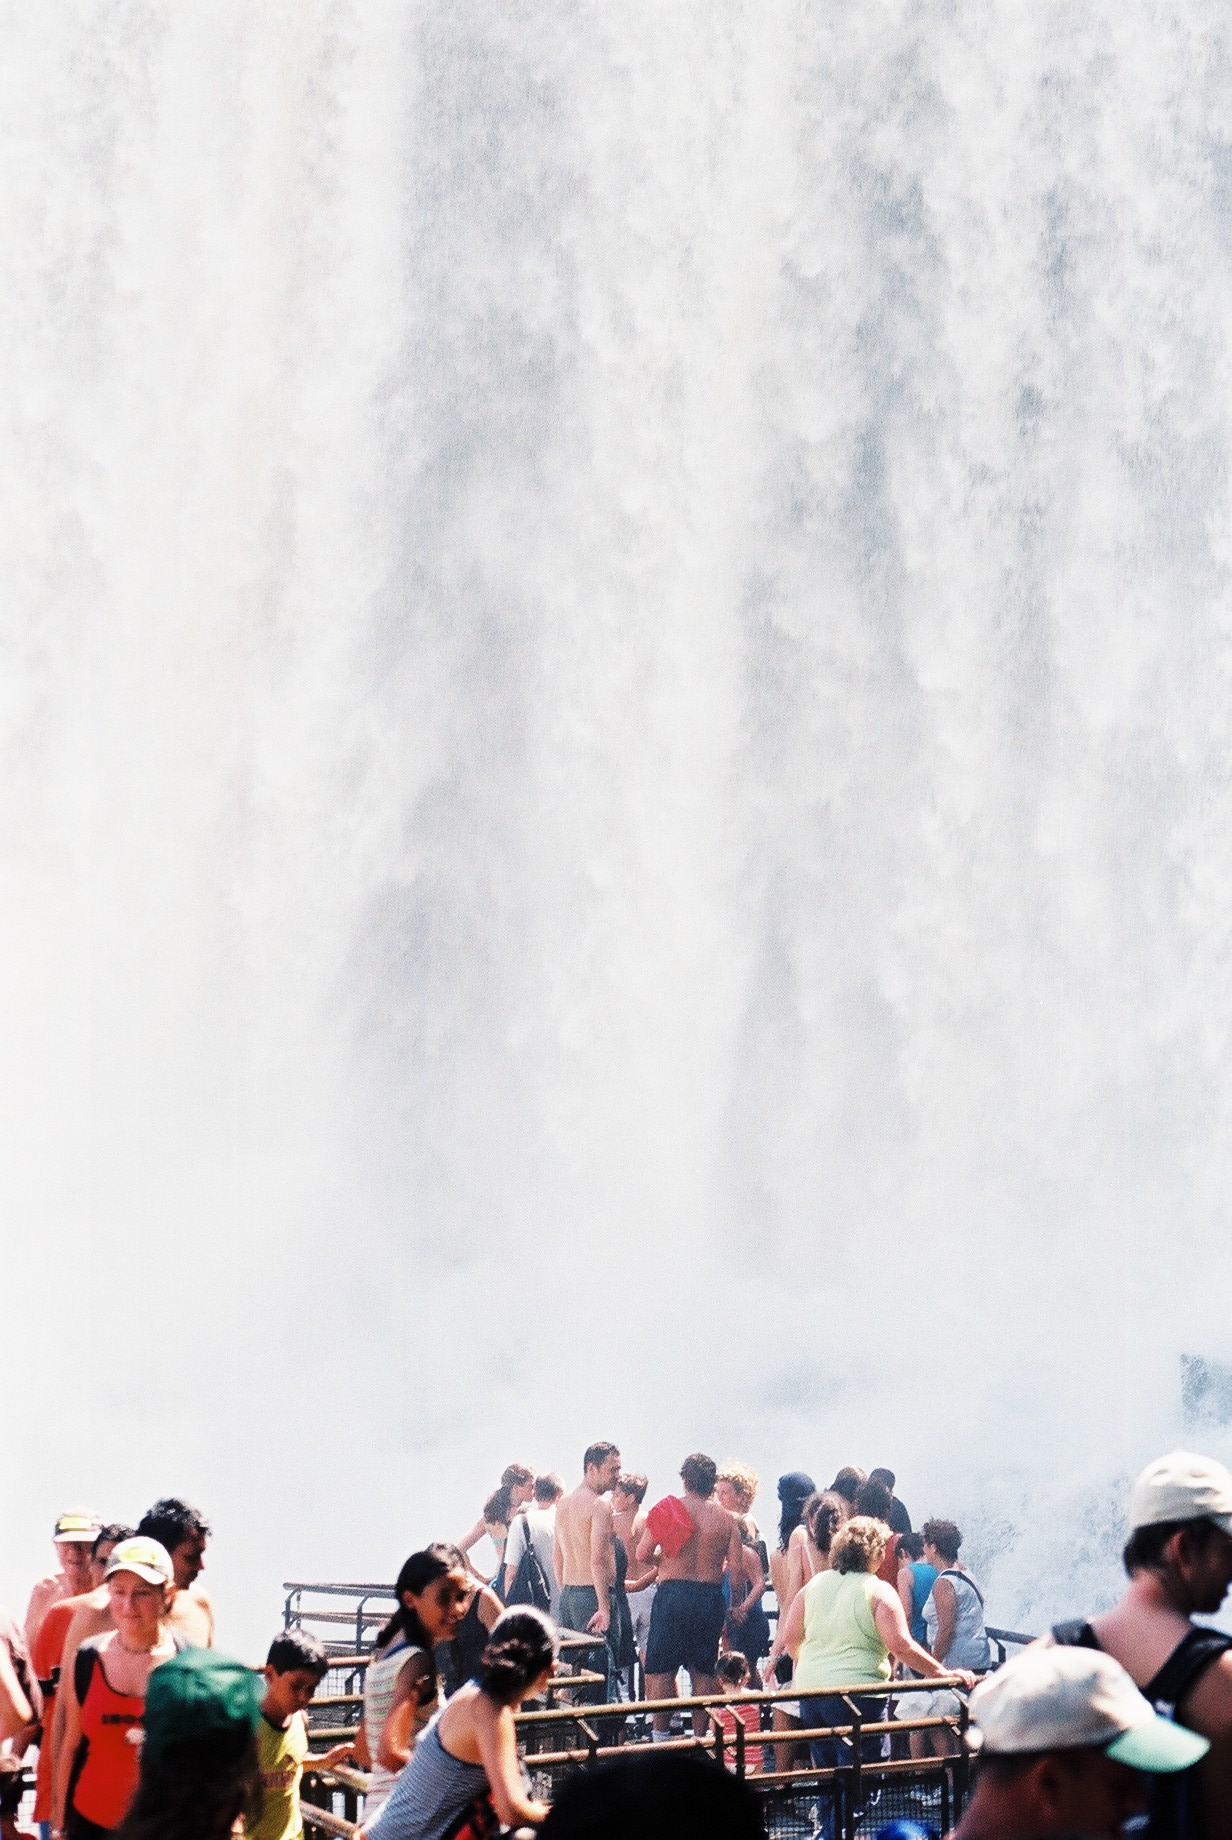 Waterfall, Iguazu.JPG